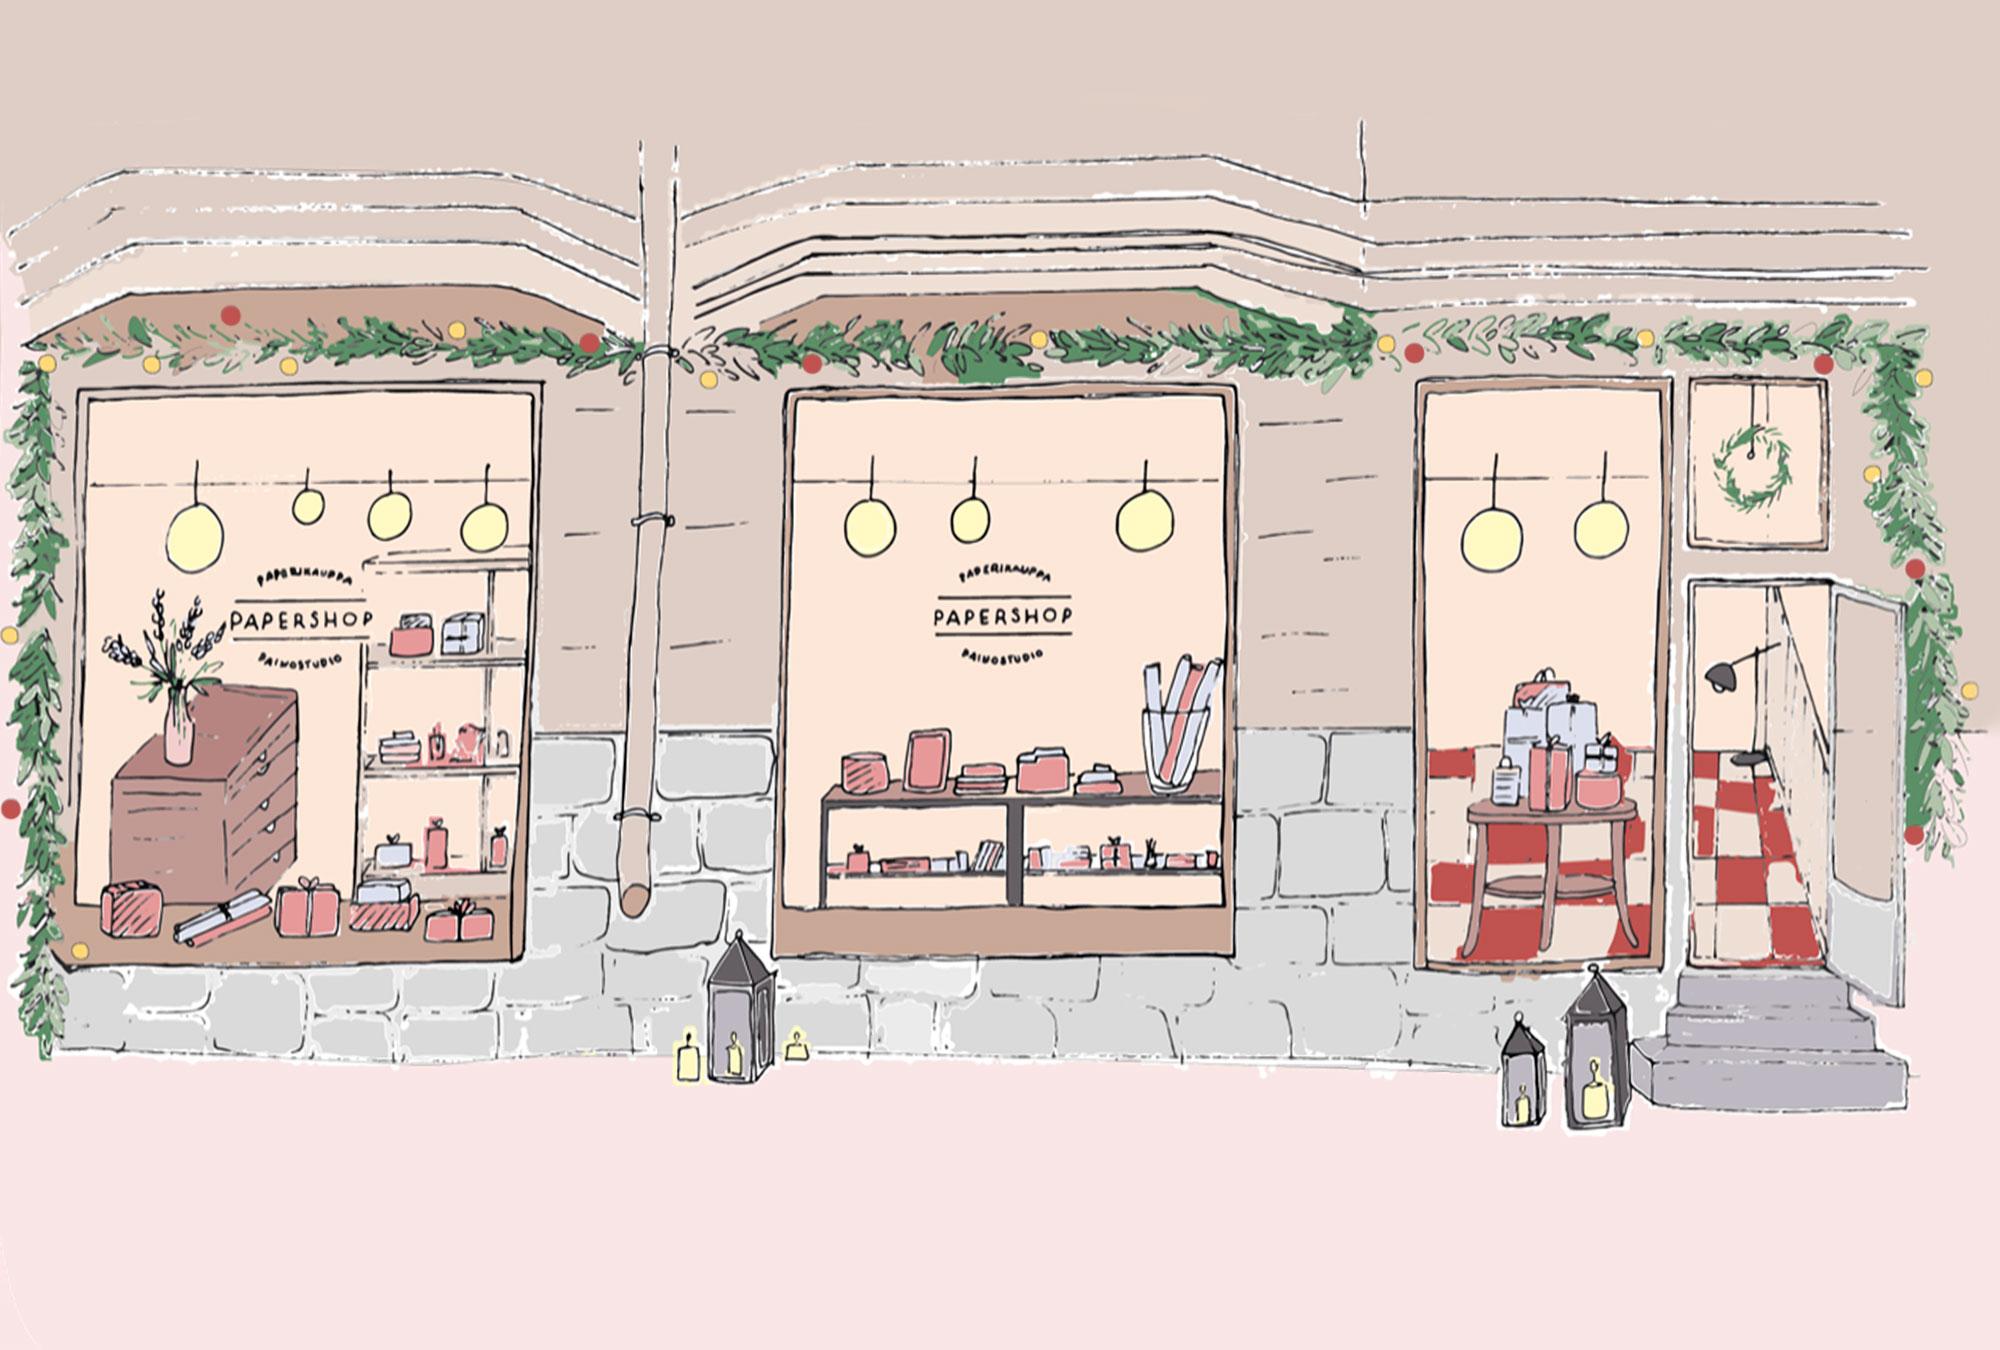 Papershop_joulukauppa_kansi_cover